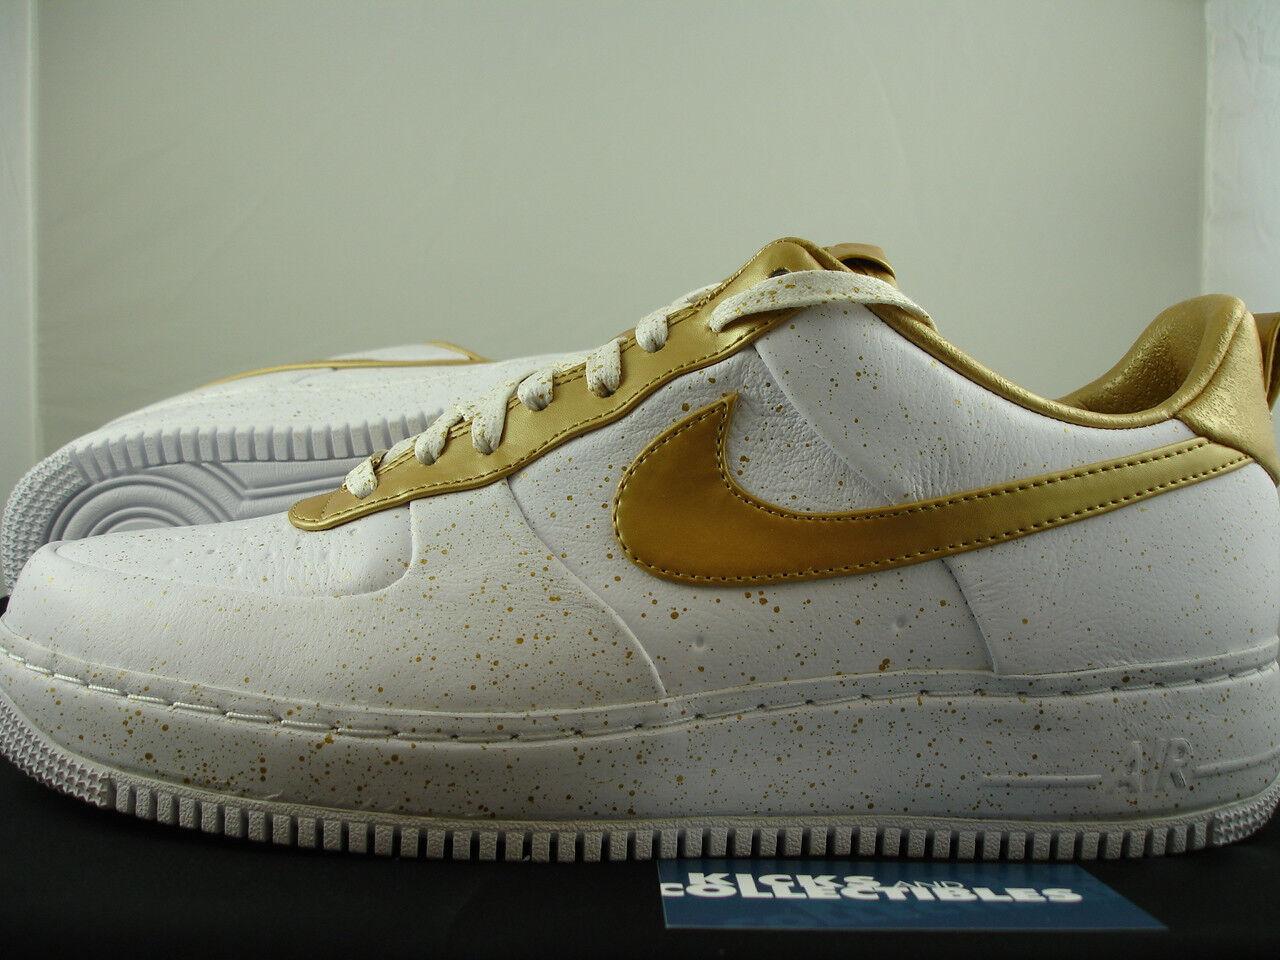 Nike Supreme Air Force 1 Low Supreme Nike TZ 11.5 12 13 Gold premium lebron 516630-170 3b4f13